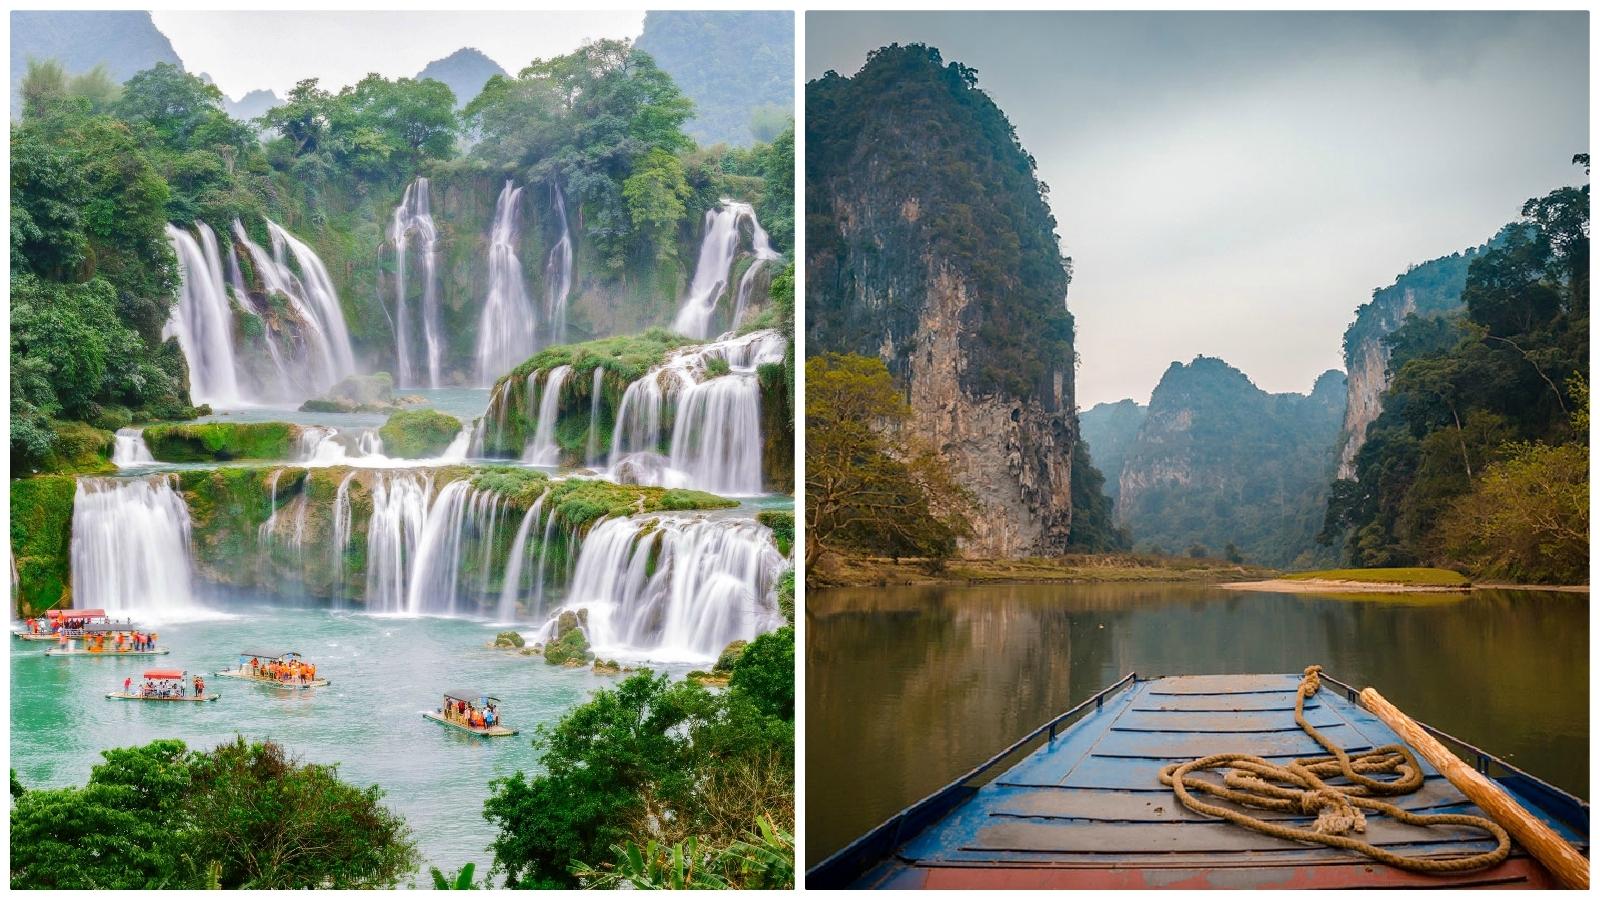 Ba Be Lake & Ban Gioc Waterfall